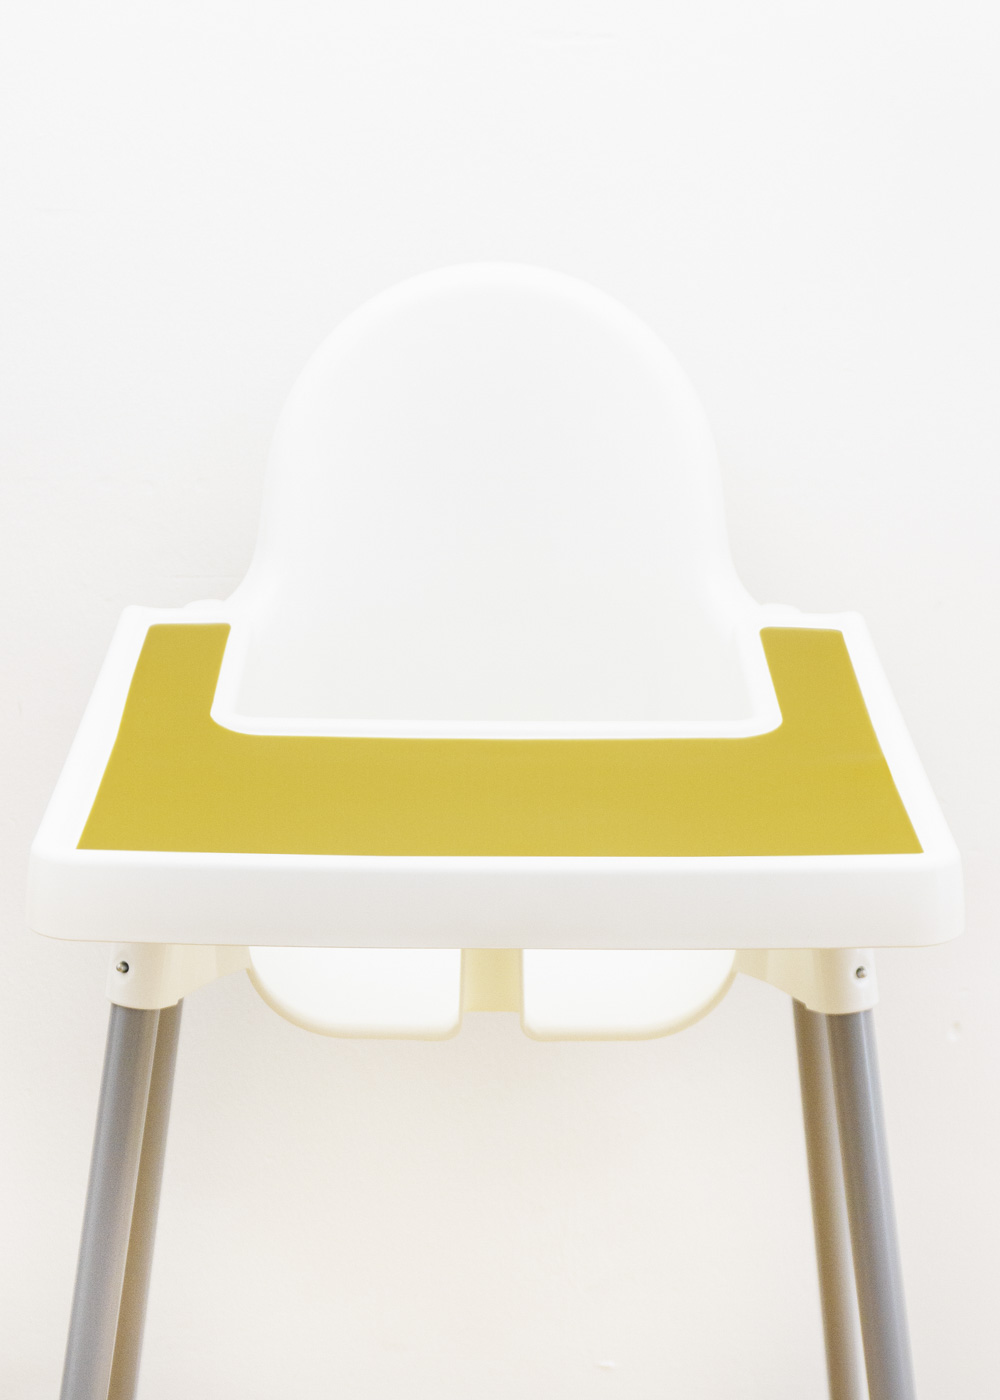 Silikonmatte Ikea Antilop Hochstuhl Klecka Mat senf